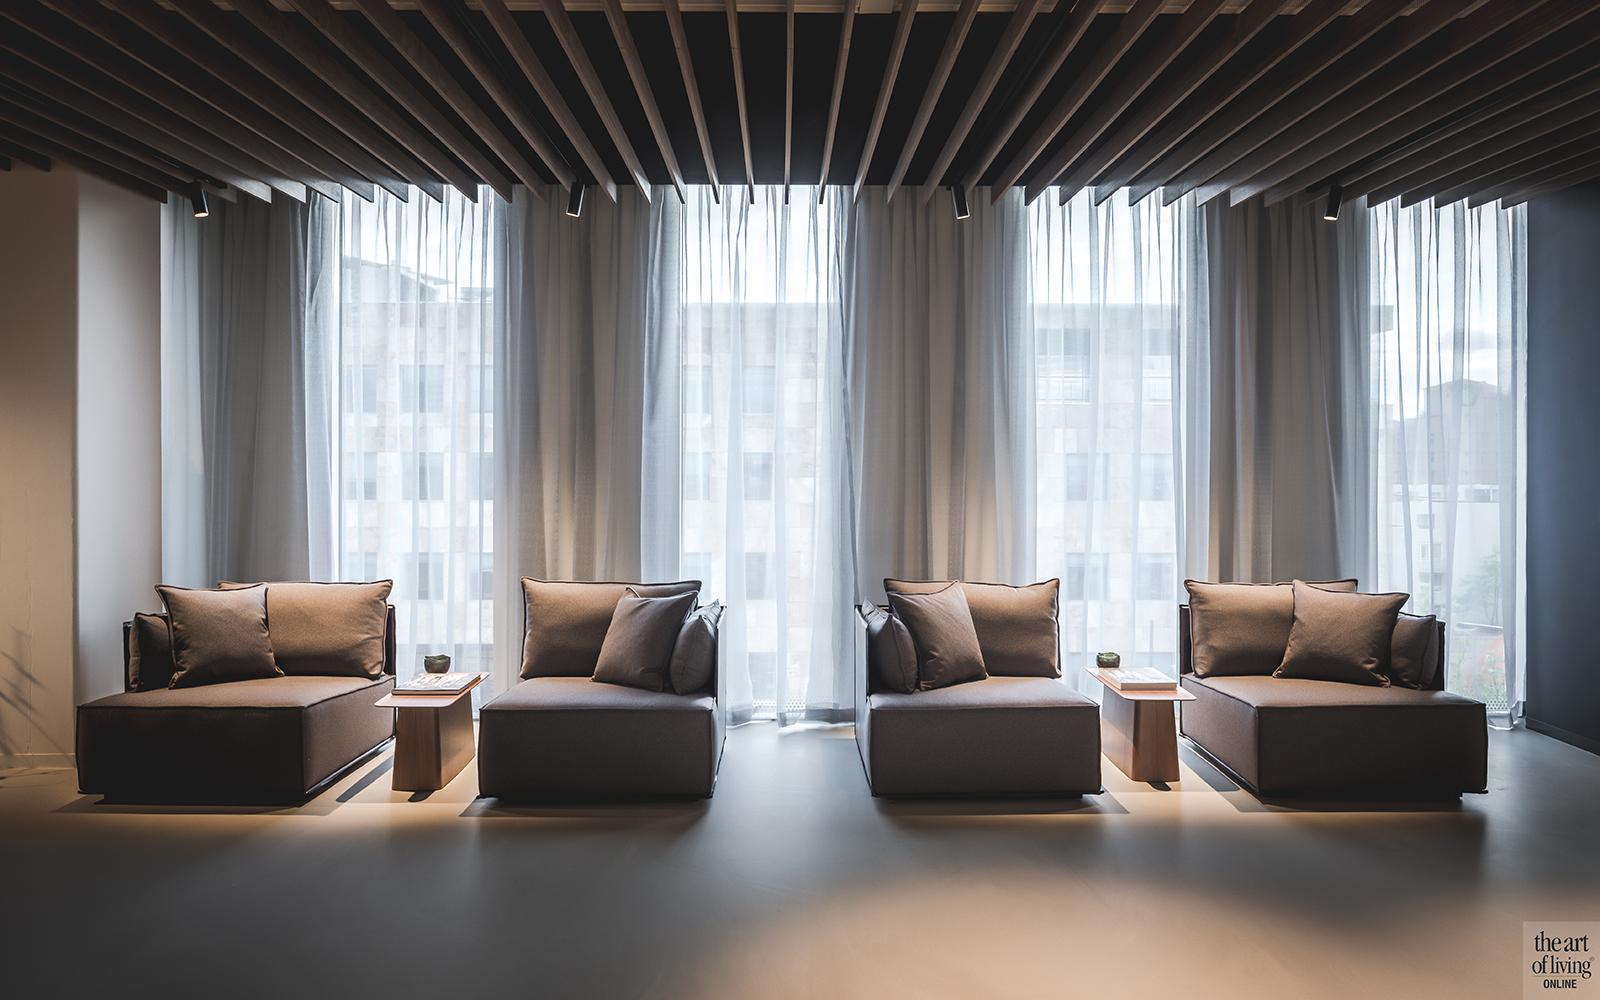 Kantoor inspiratie,, Kabaz Architecten, Kantoor Amsterdam, Amsterdam, Kantoor inrichting, Design, Architectuur, Interieur, Equinix, Lounge, Werkplek